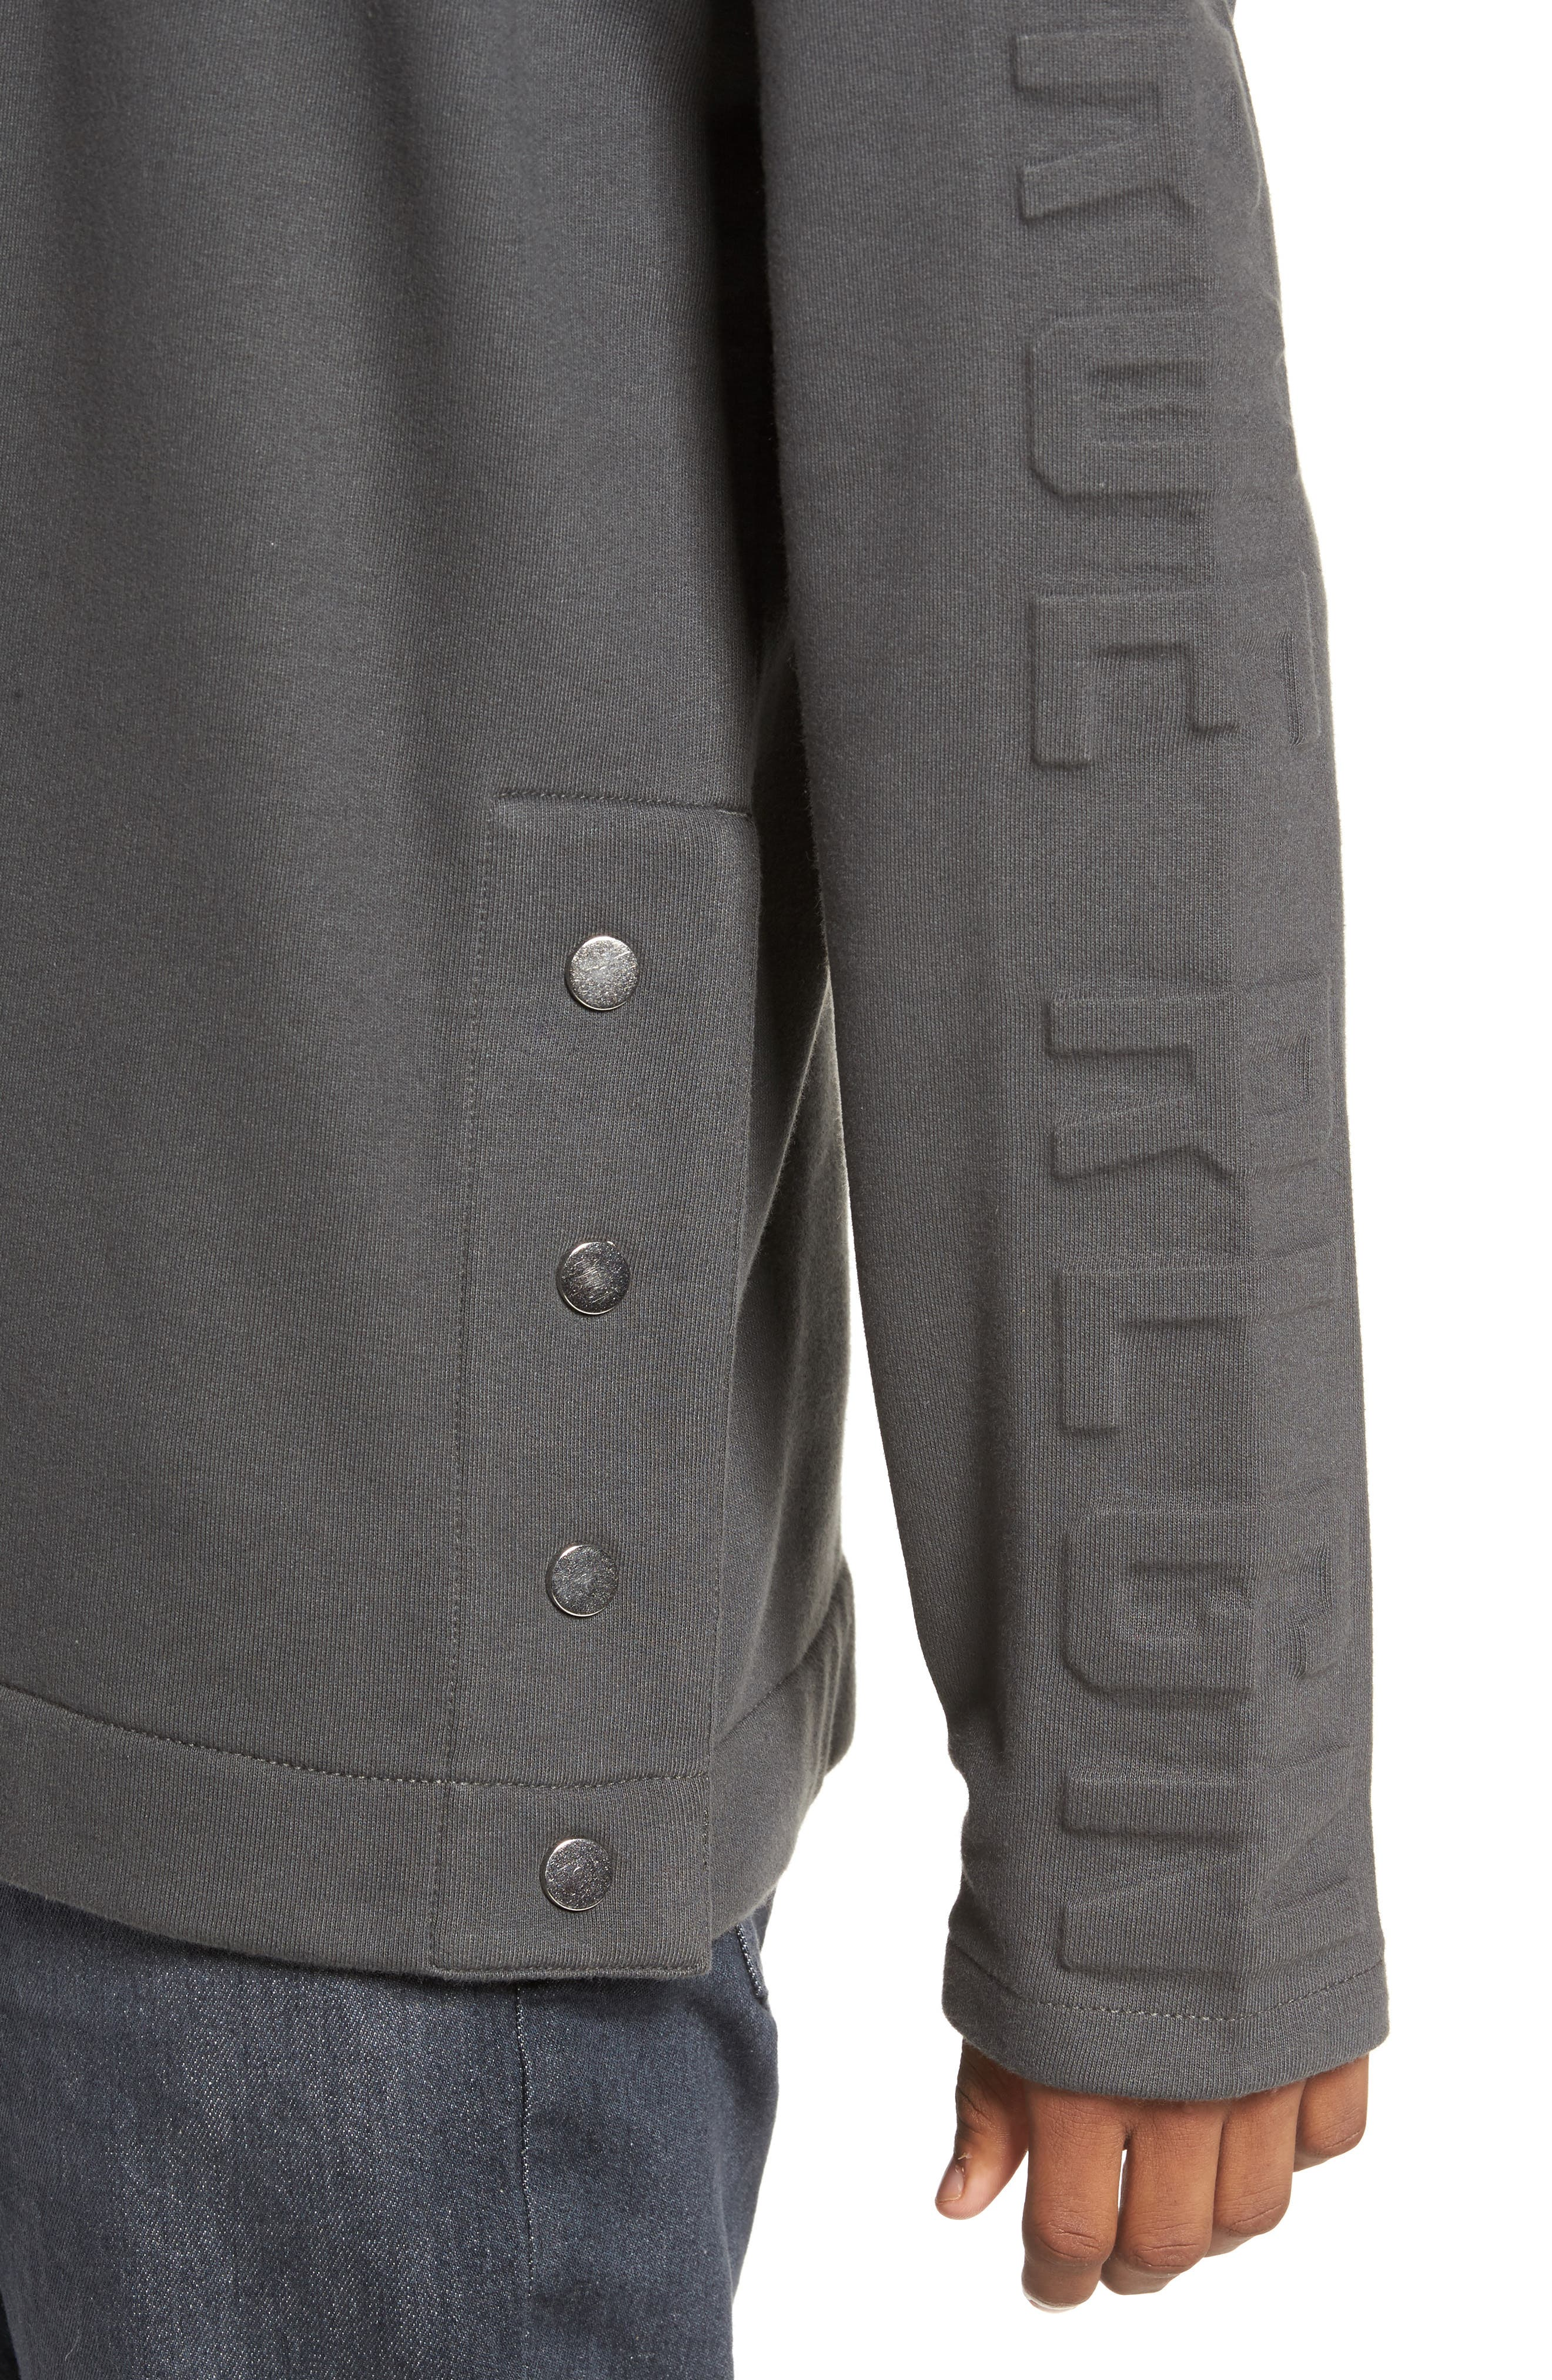 Oversize Fleece Sweatshirt,                             Alternate thumbnail 4, color,                             020